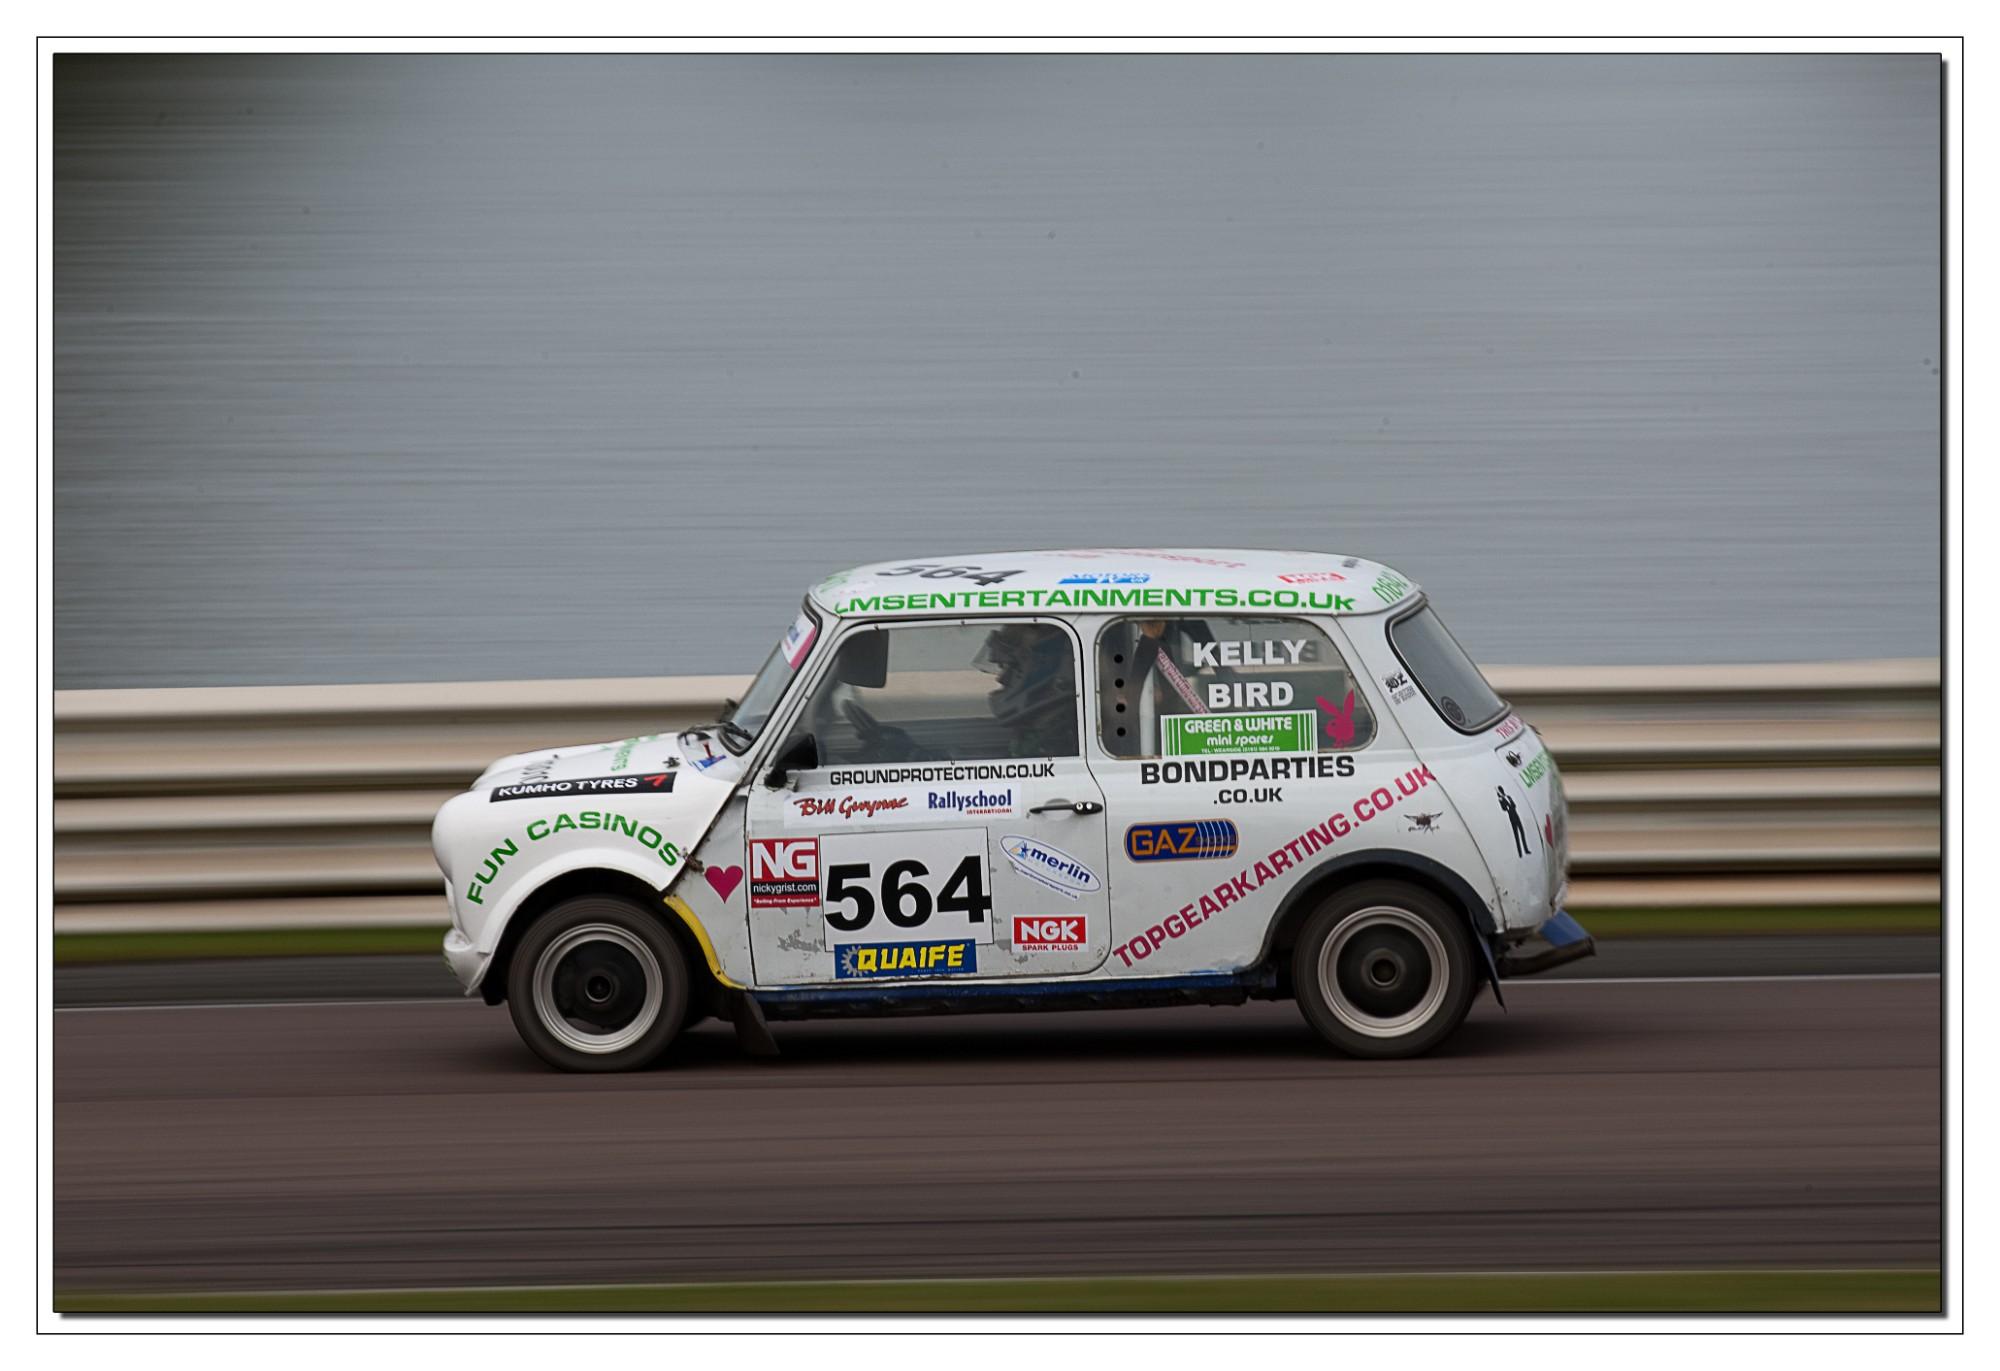 IMAGE: http://www.mark.colston-online.co.uk/Motorsport/Mallory%20Park/Rally%20Cross%202009/slides/IMG_5309%20EOS-1D%20Mark%20III%20copy.jpg